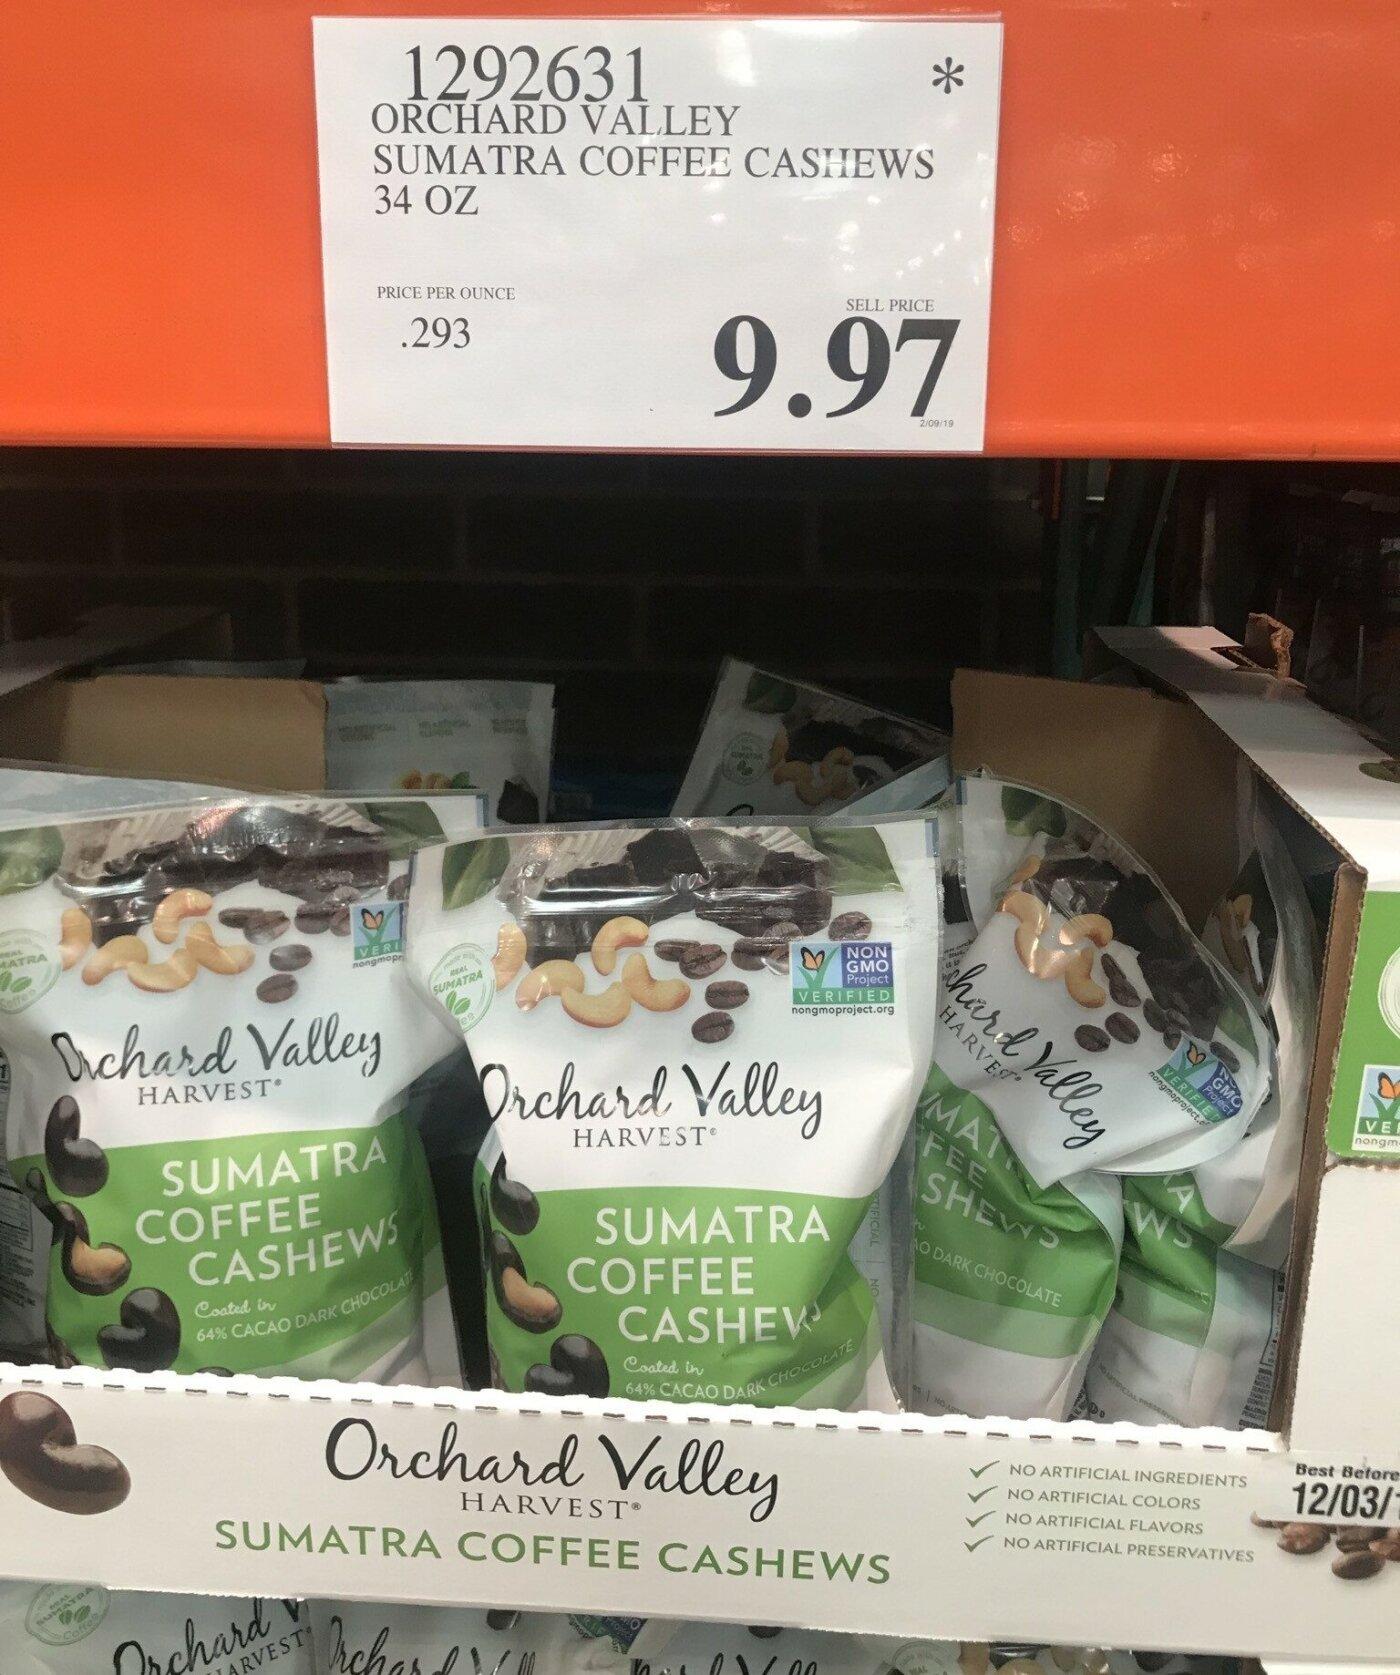 Orchard Valley Sumatra Coffee Cashews